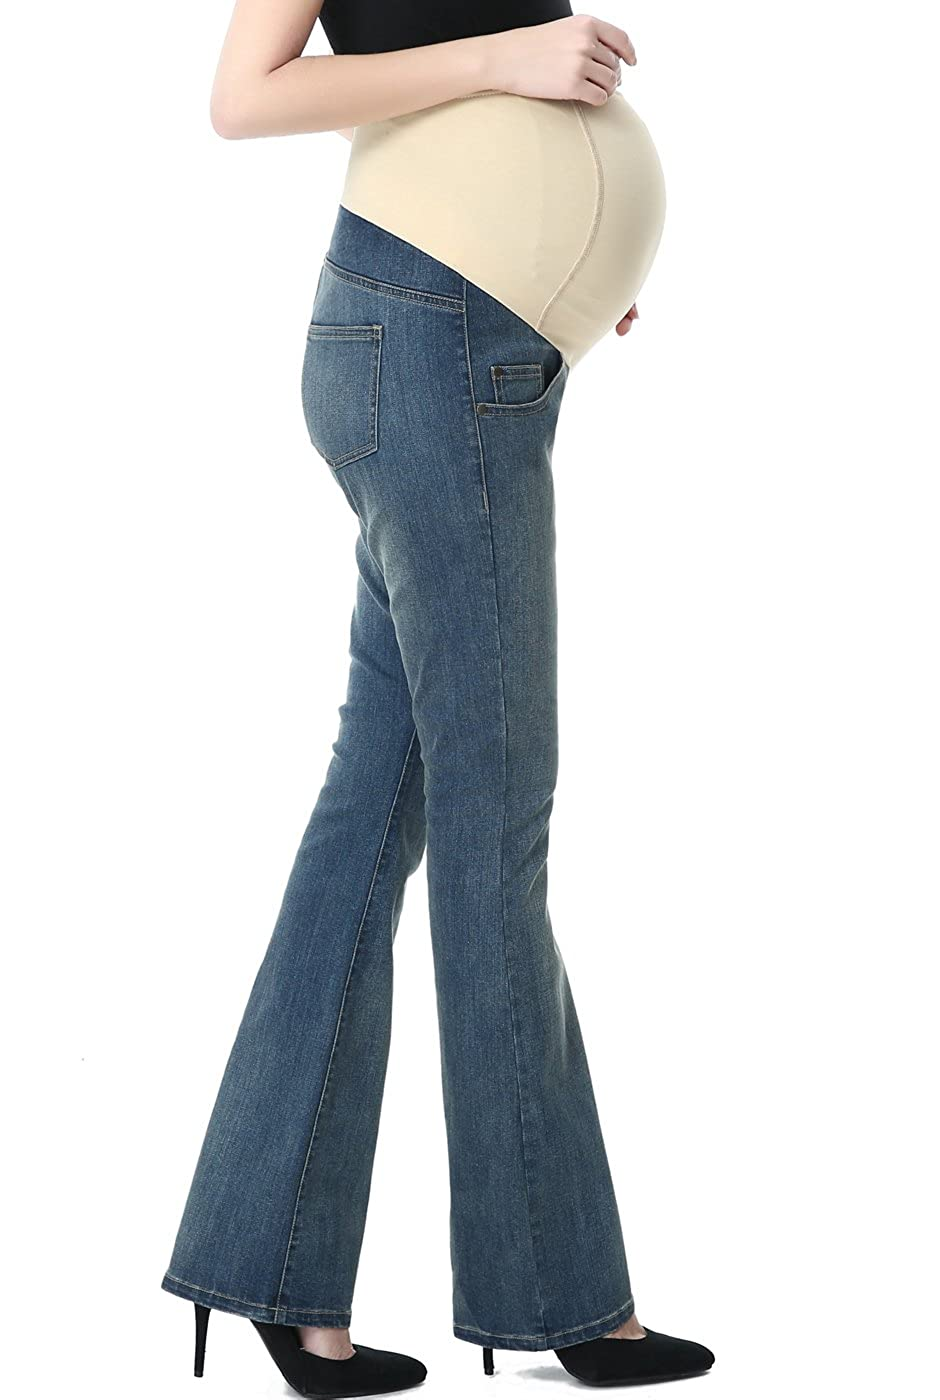 Momo Maternity Women's Modern Boot Cut Denim Jeans